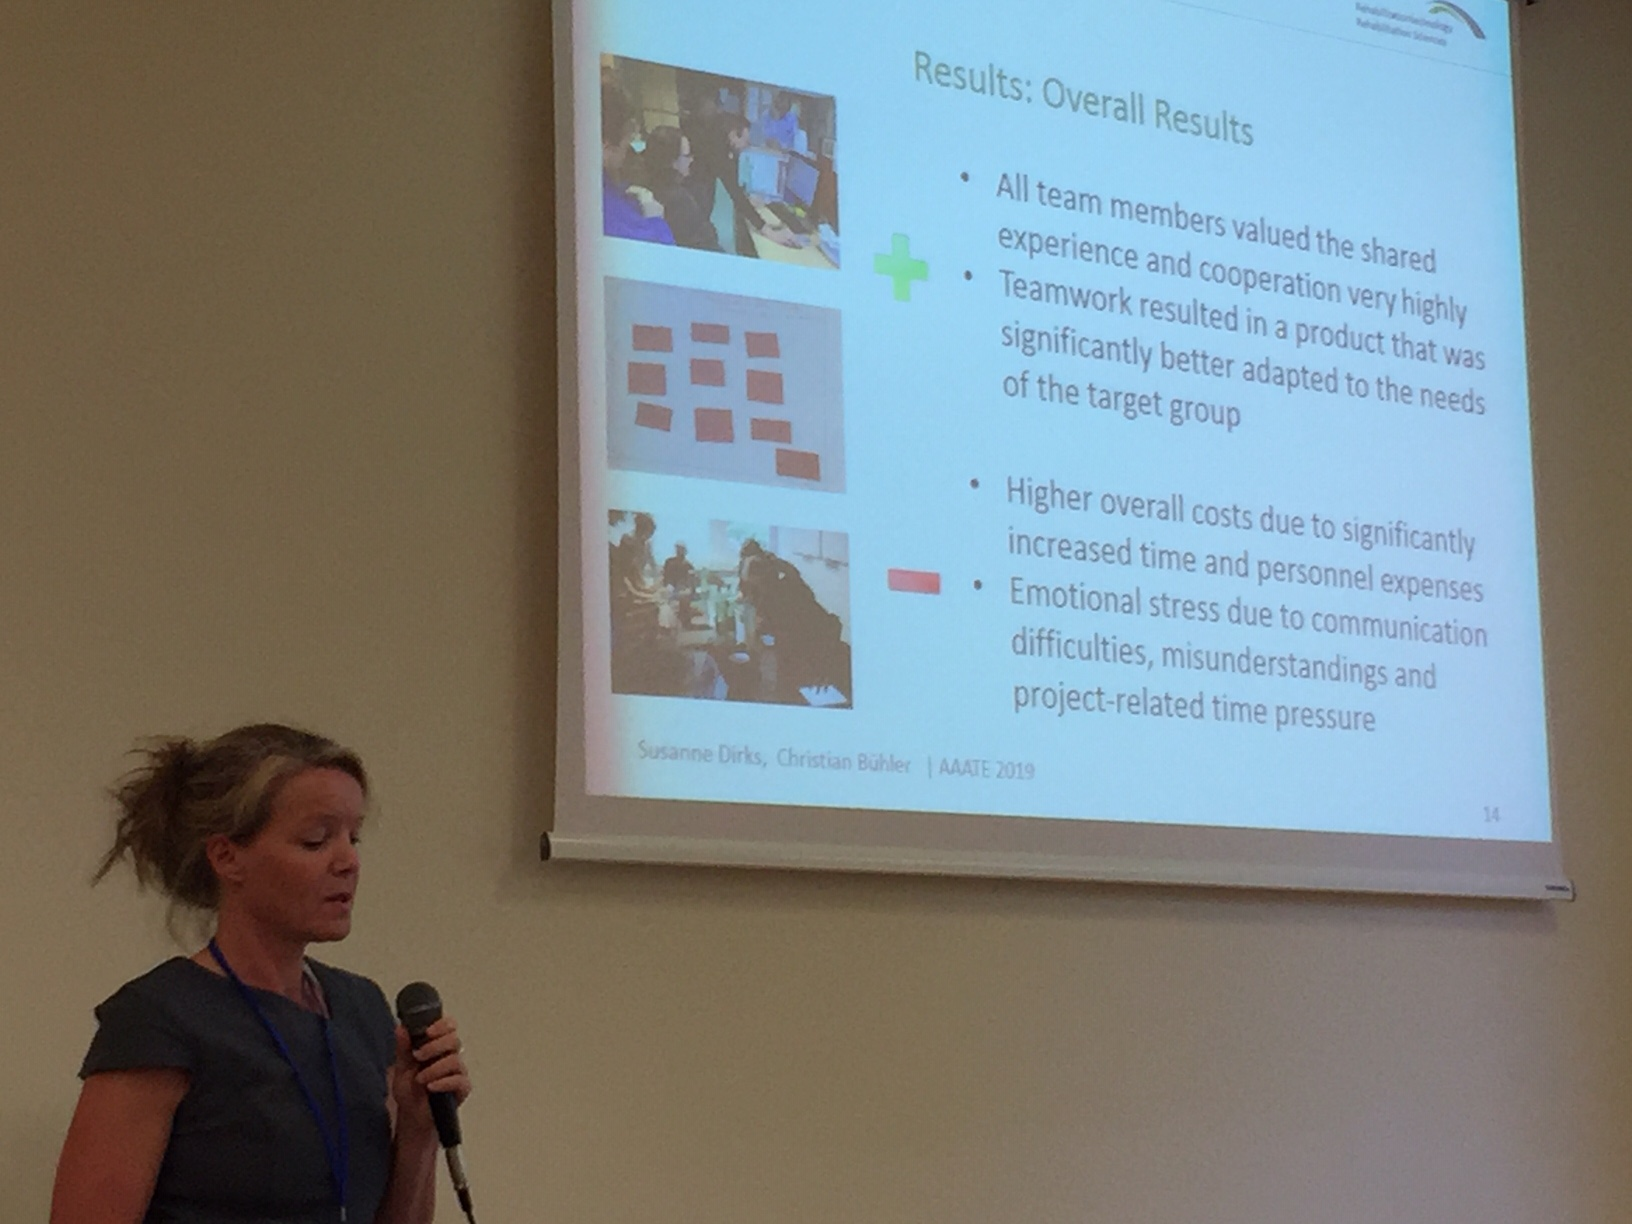 Susanne Dirks presenting